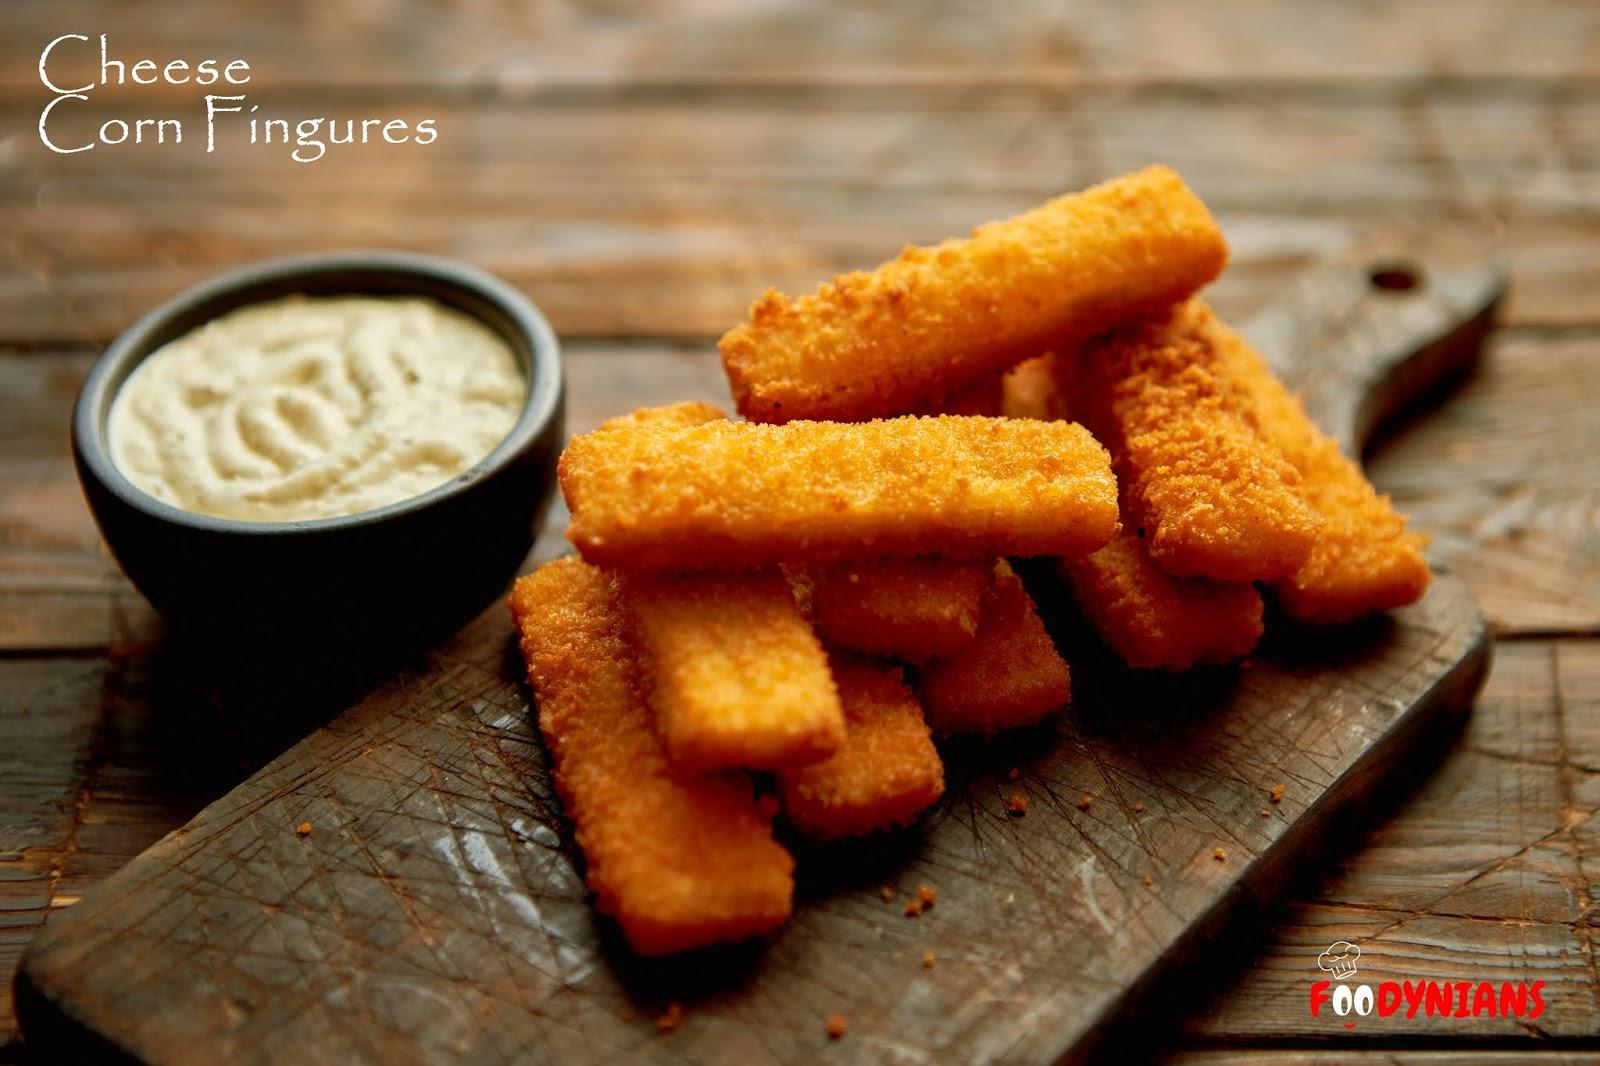 Cheese Corn Fingure, Cheese Nuggets, Veg Nuggets